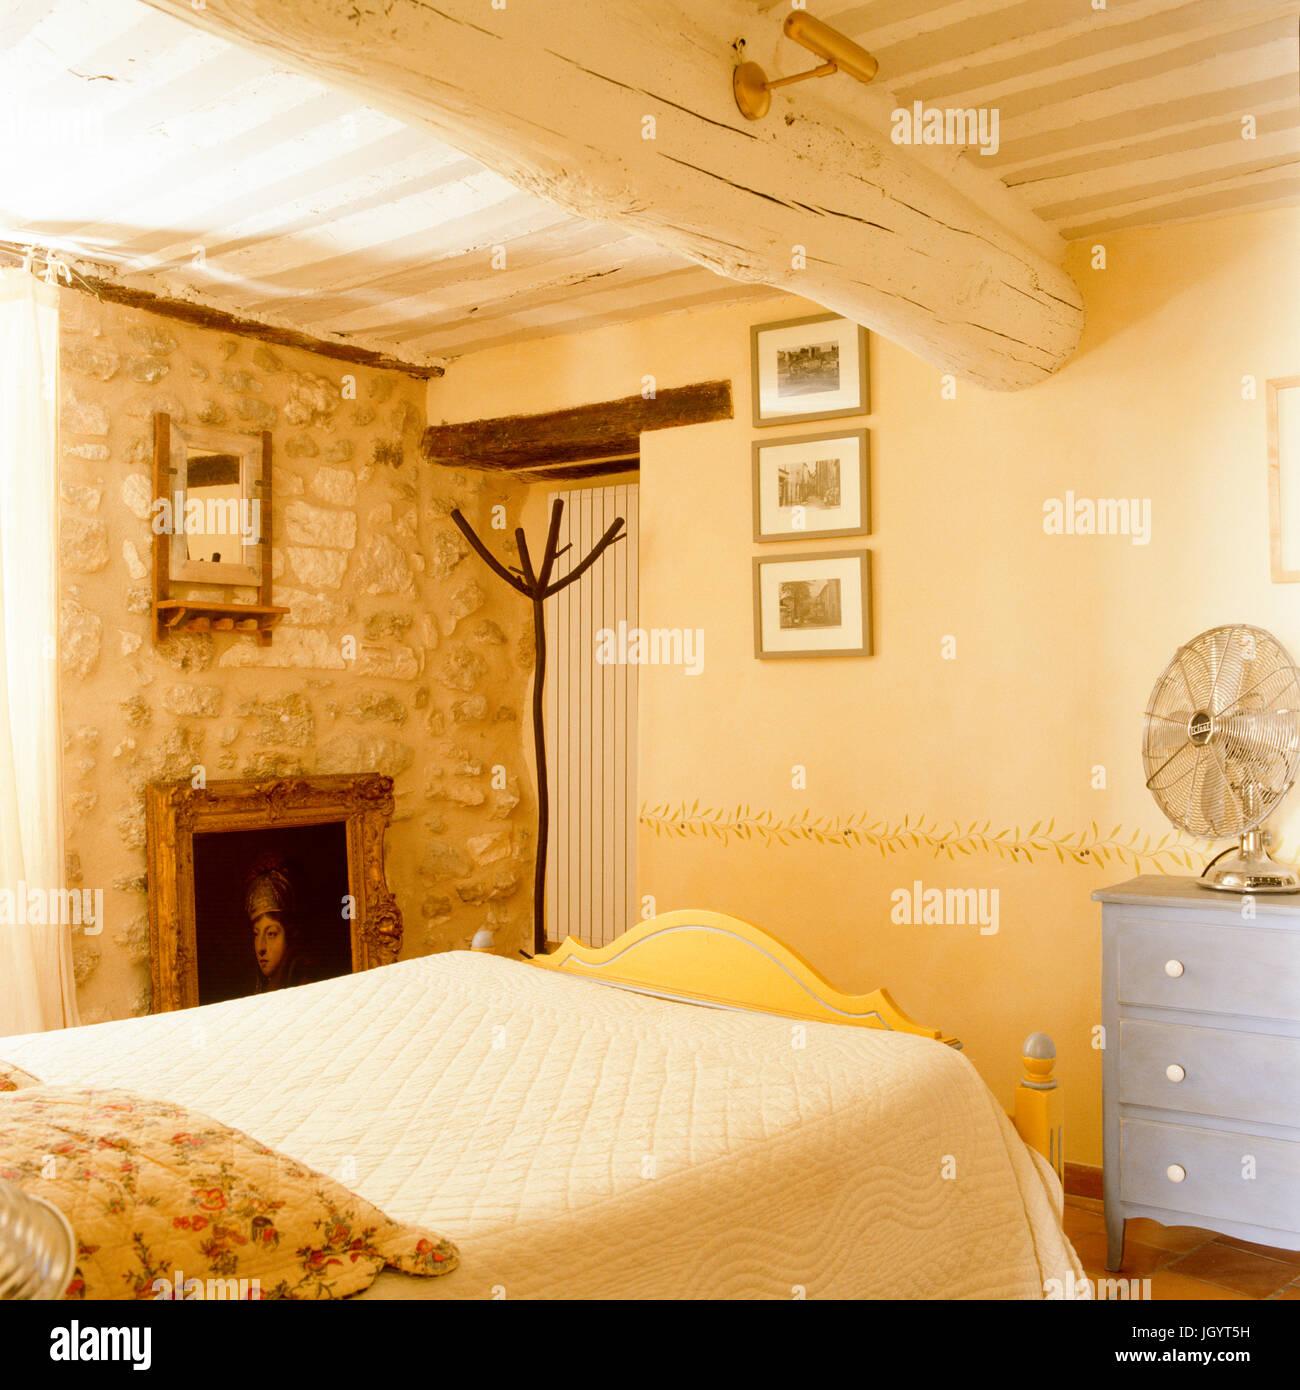 Rustikale Schlafzimmer Stockfoto, Bild: 148129117 - Alamy